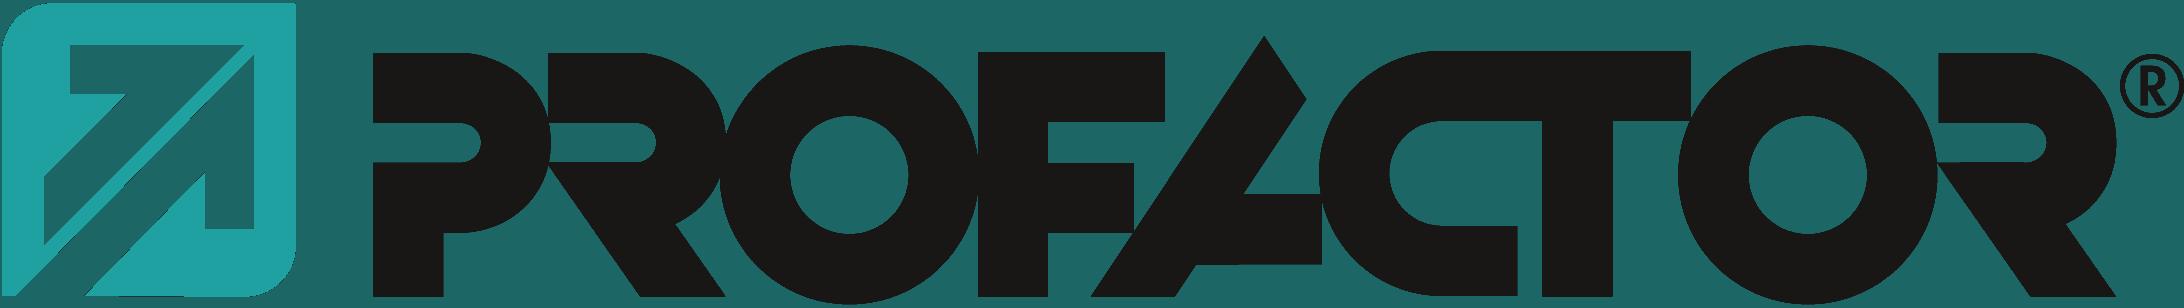 Profactor logo